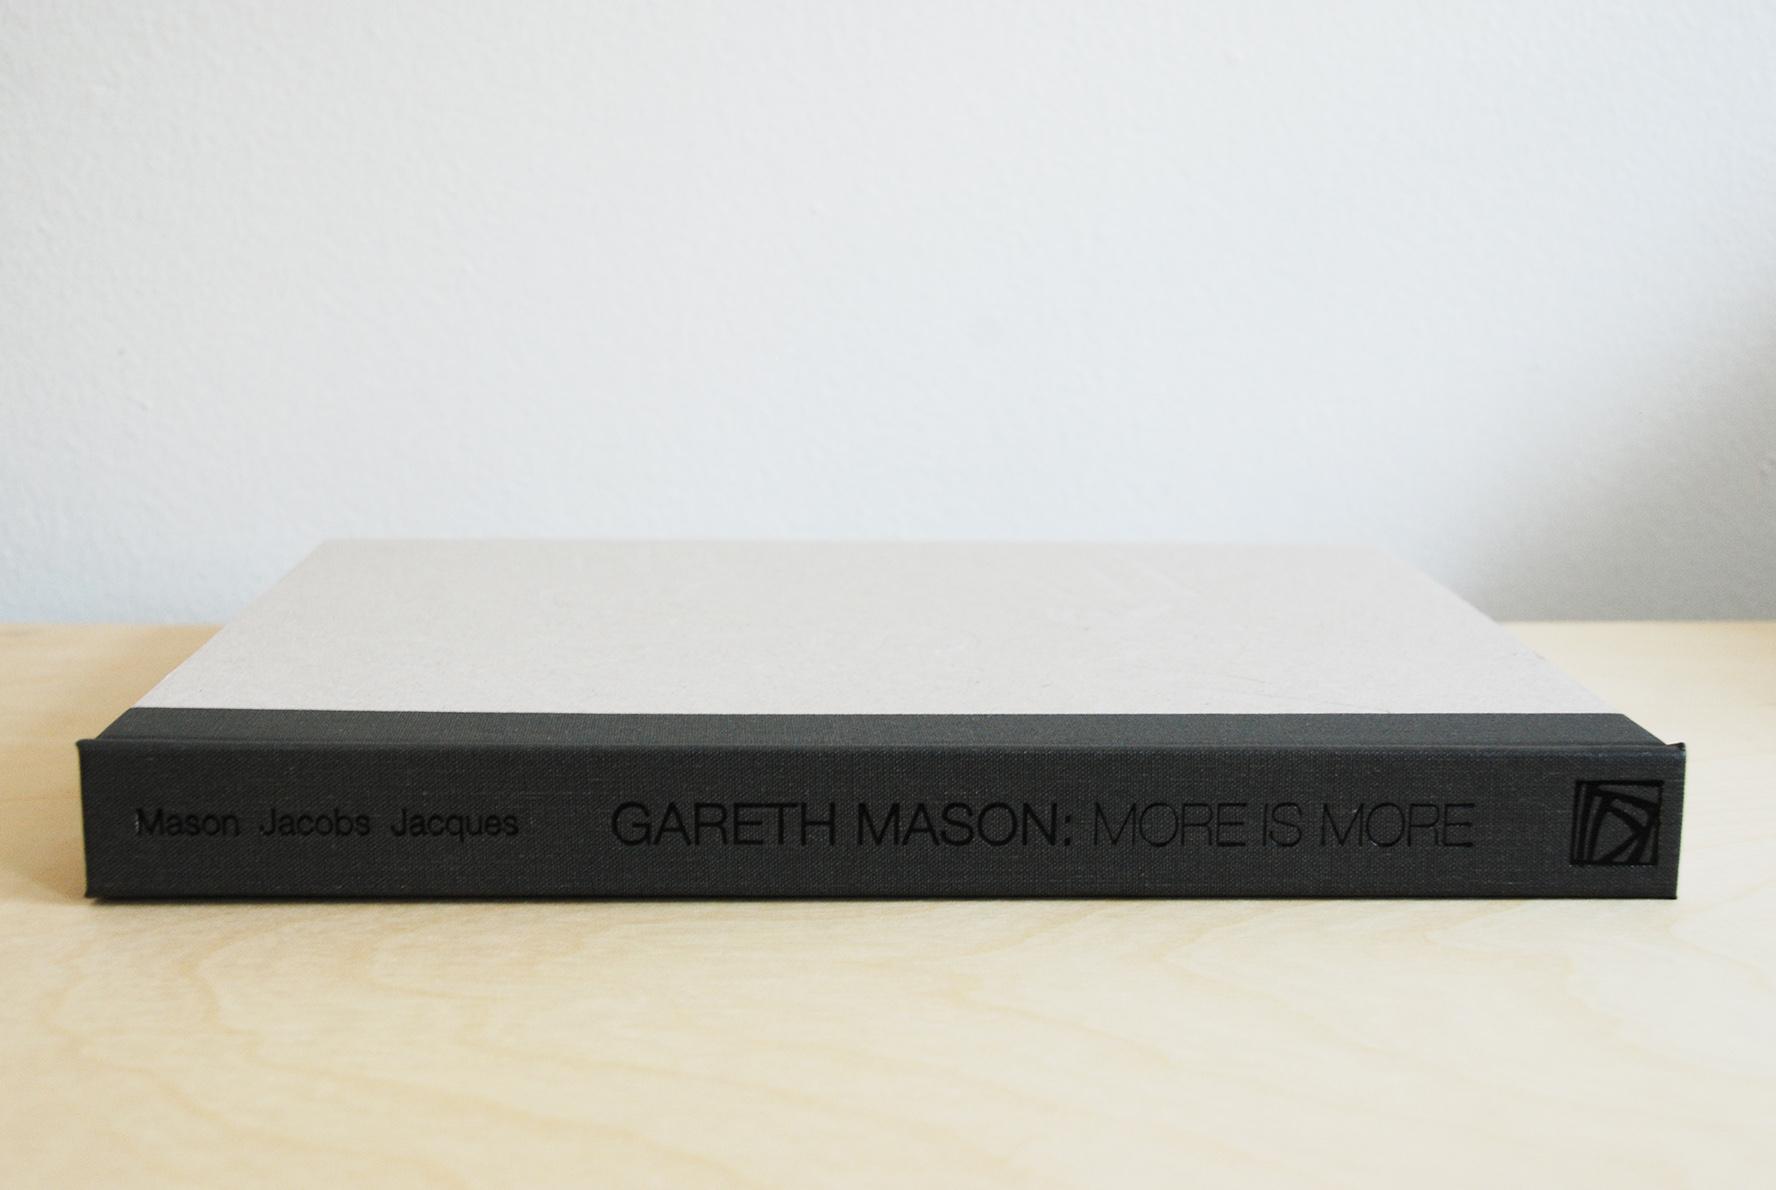 Gareth Mason: More is More Catalog design